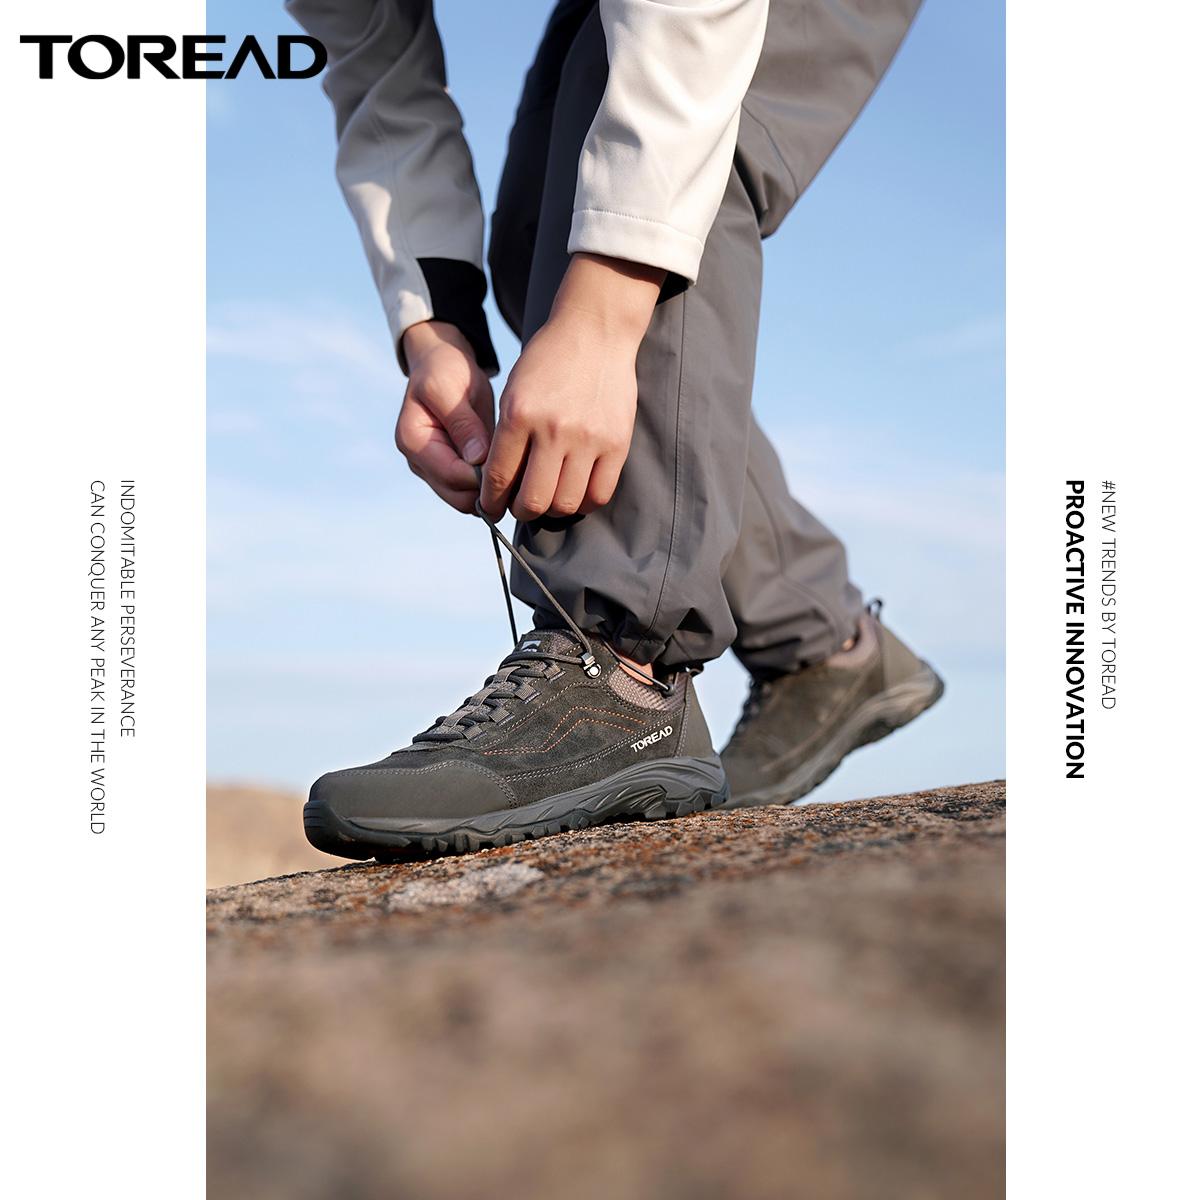 Toread 探路者 TREKKING 徒步系列 户外徒步登山鞋 聚划算双重优惠折后¥199包邮 男、女多色可选